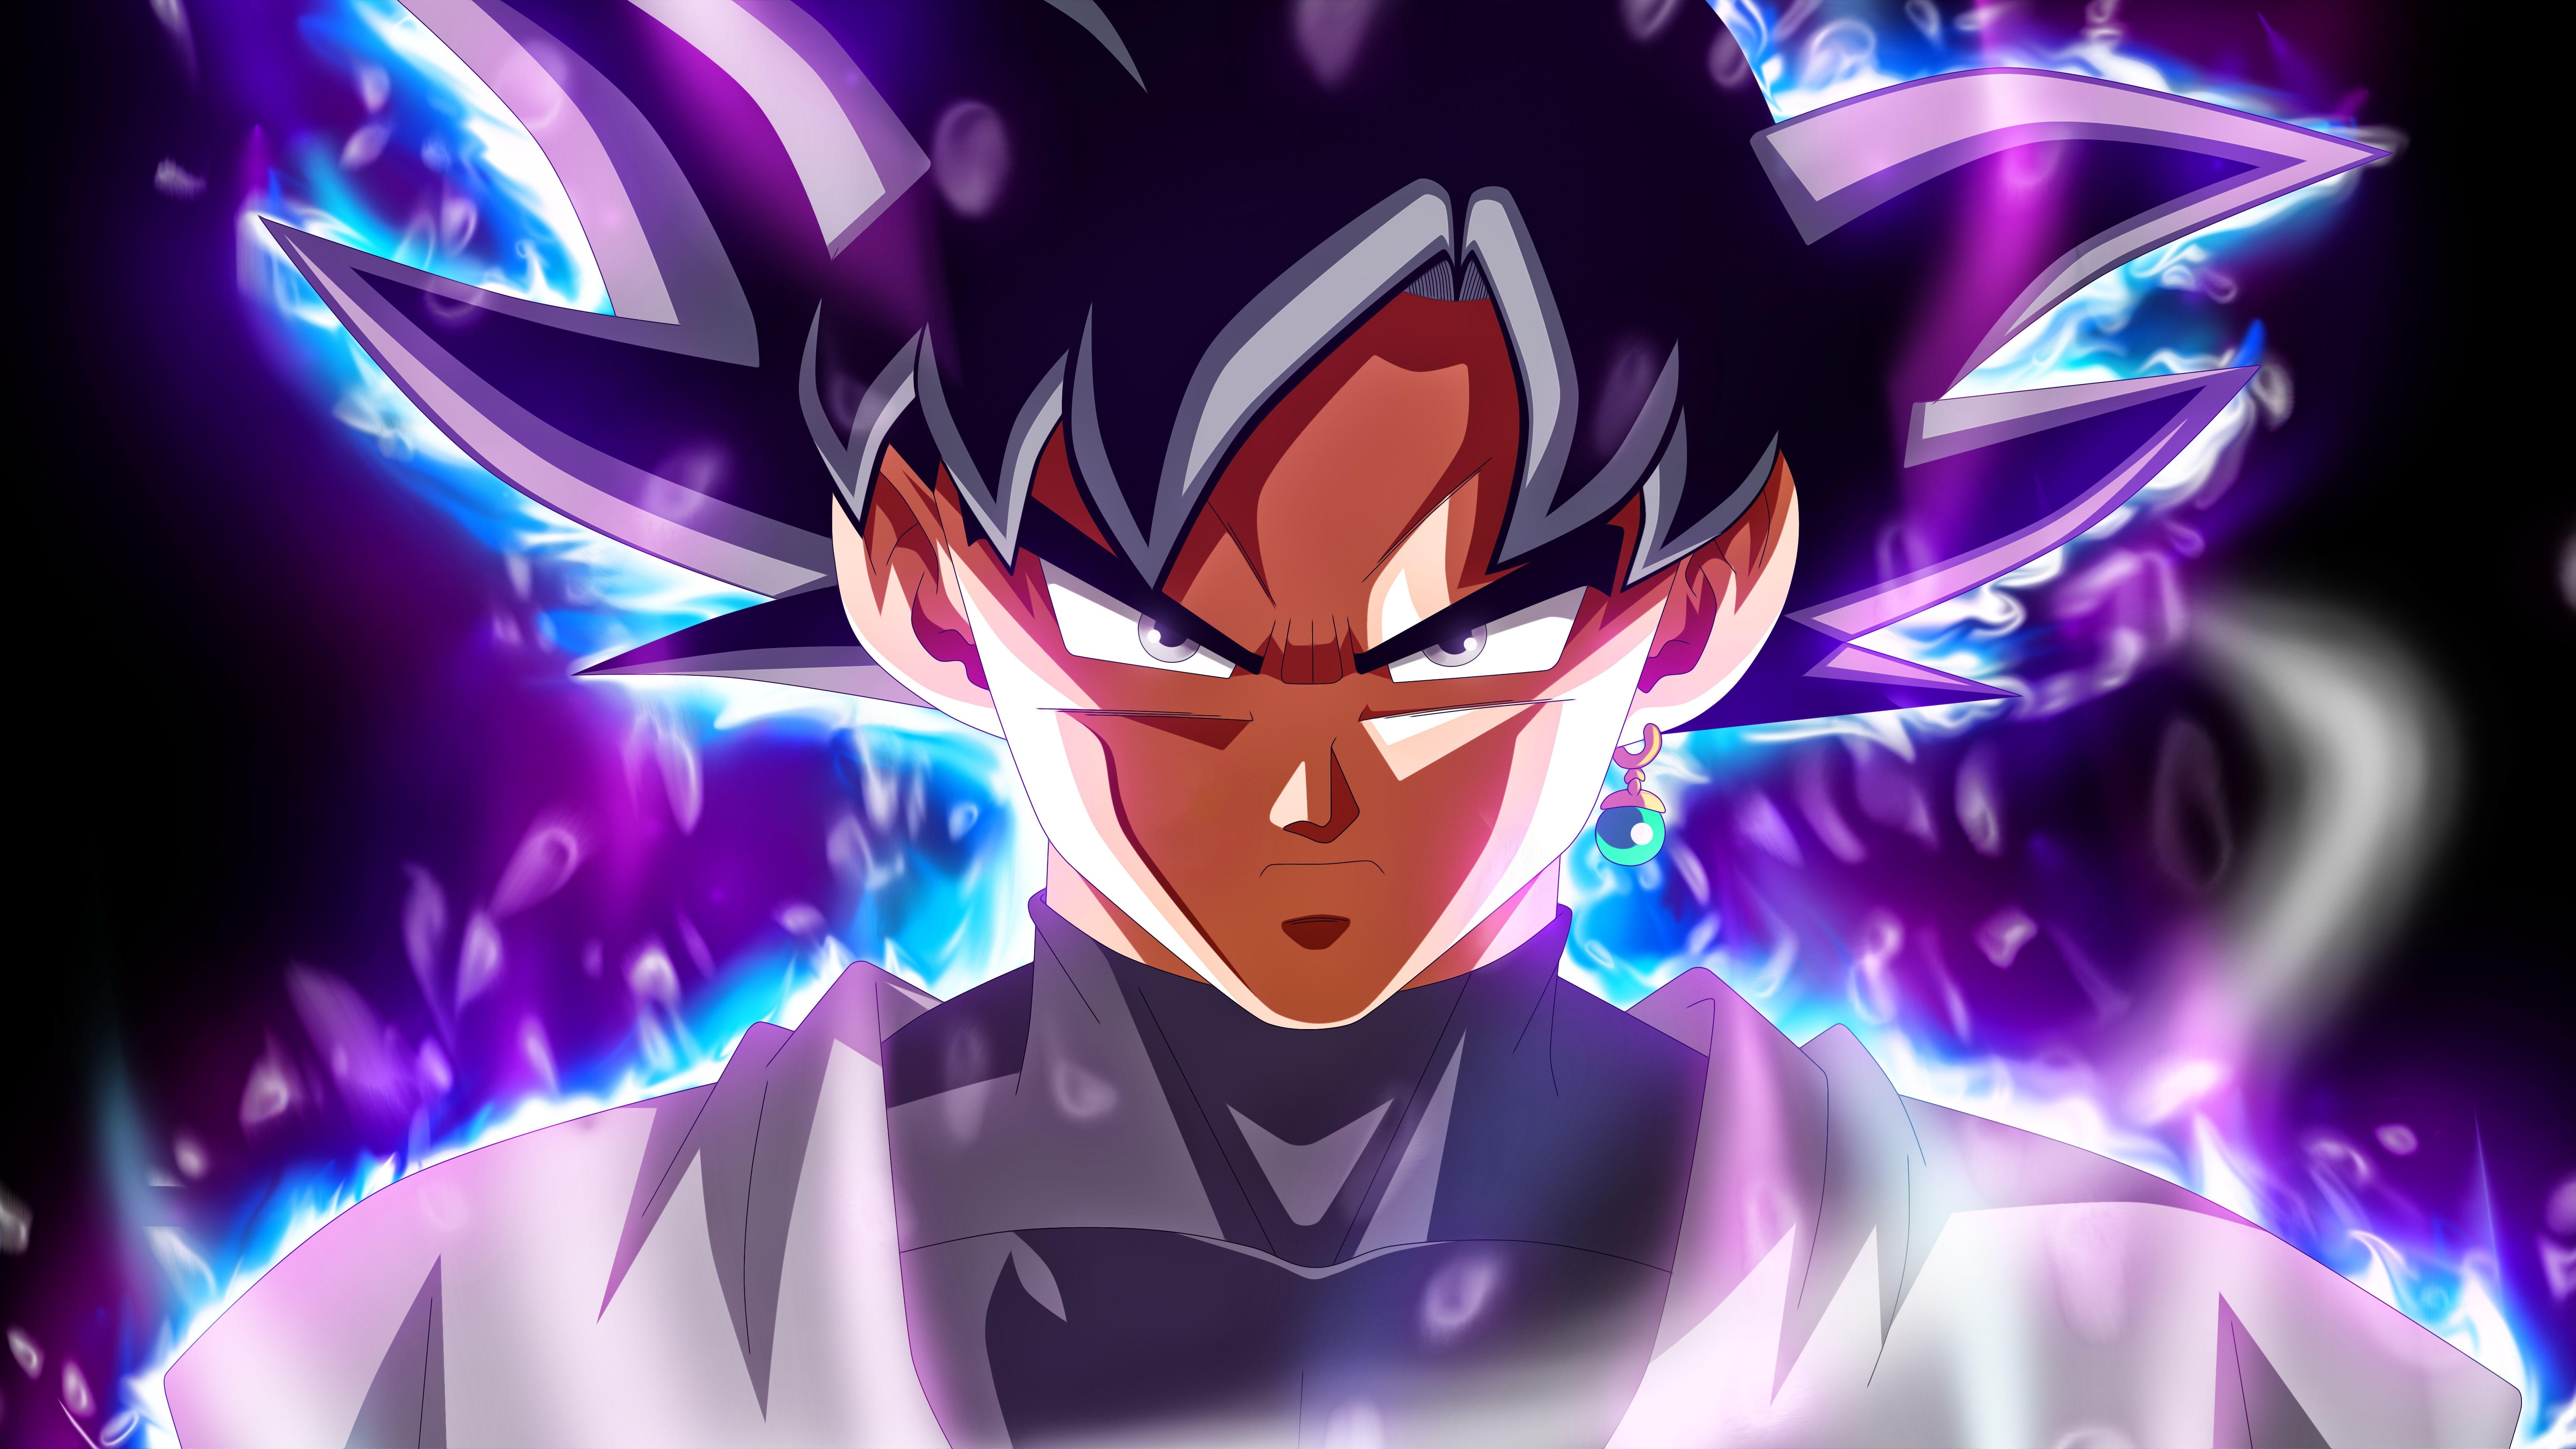 Goku Black Ultra Instinct Dragon Ball Super 8k 7675 Anime Dragon Ball Super Goku Wallpaper Dragon Ball Wallpapers